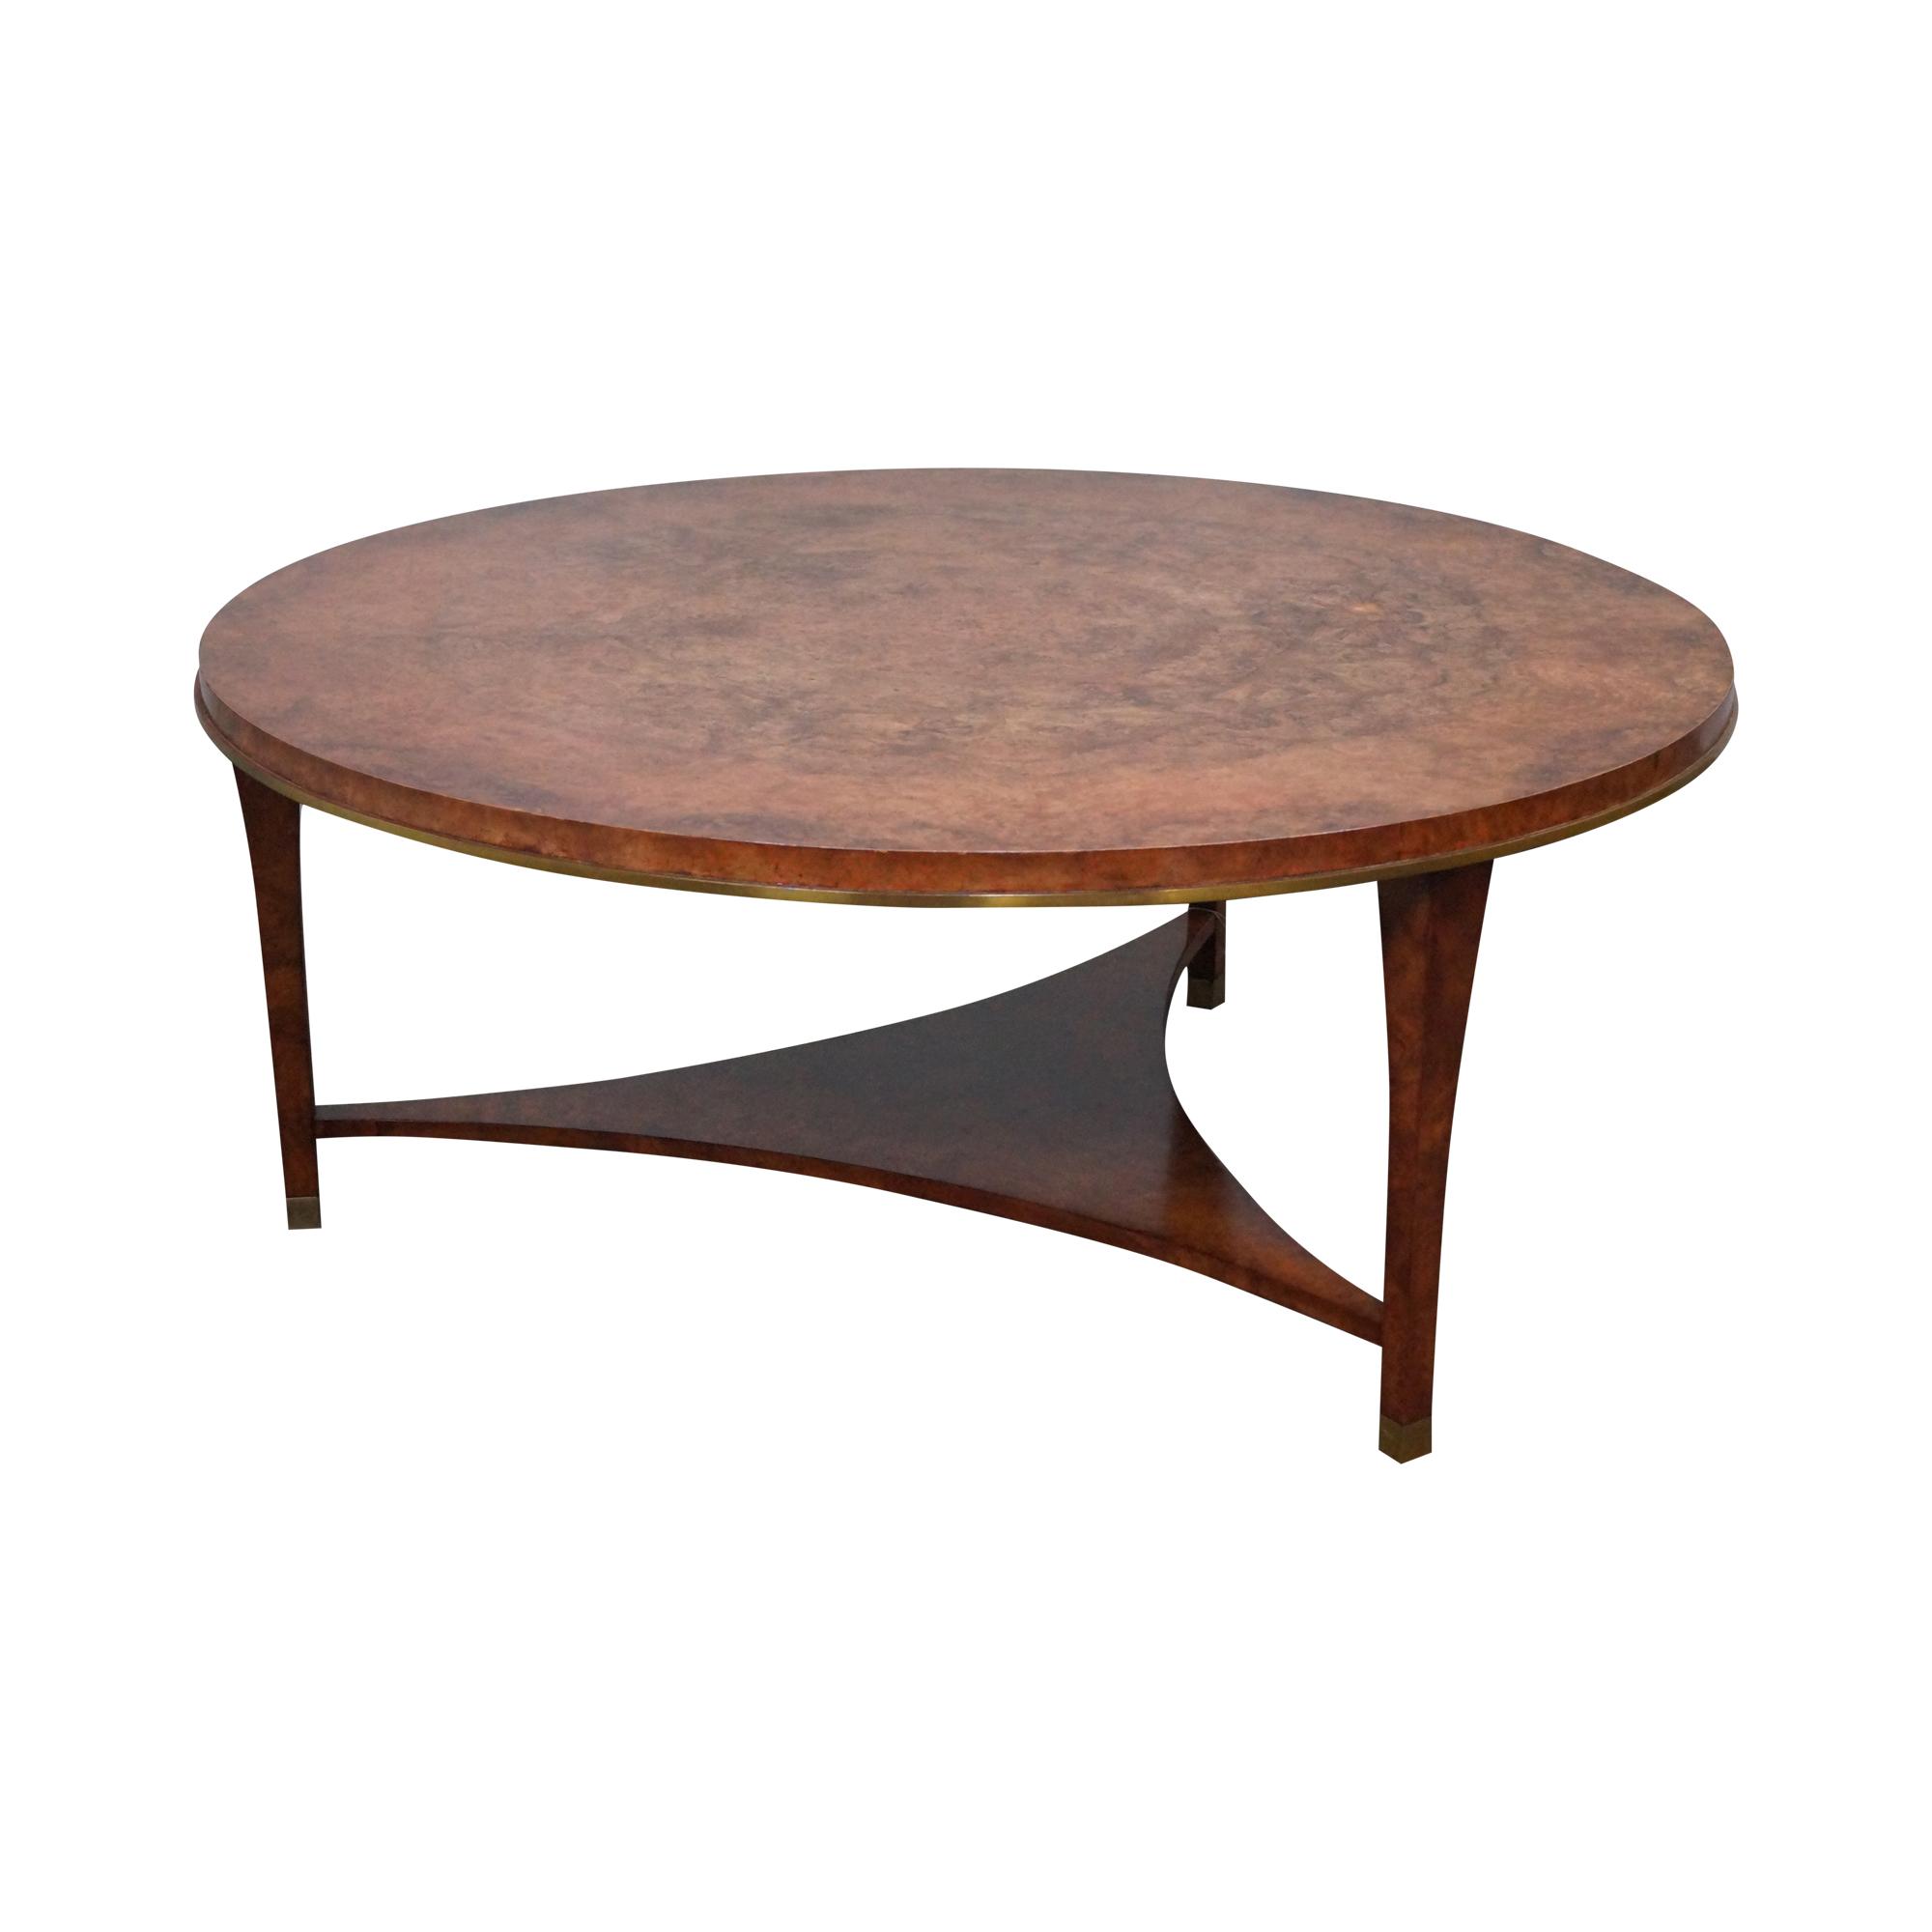 Round Burl Wood Brass Edge Coffee Table Chairish